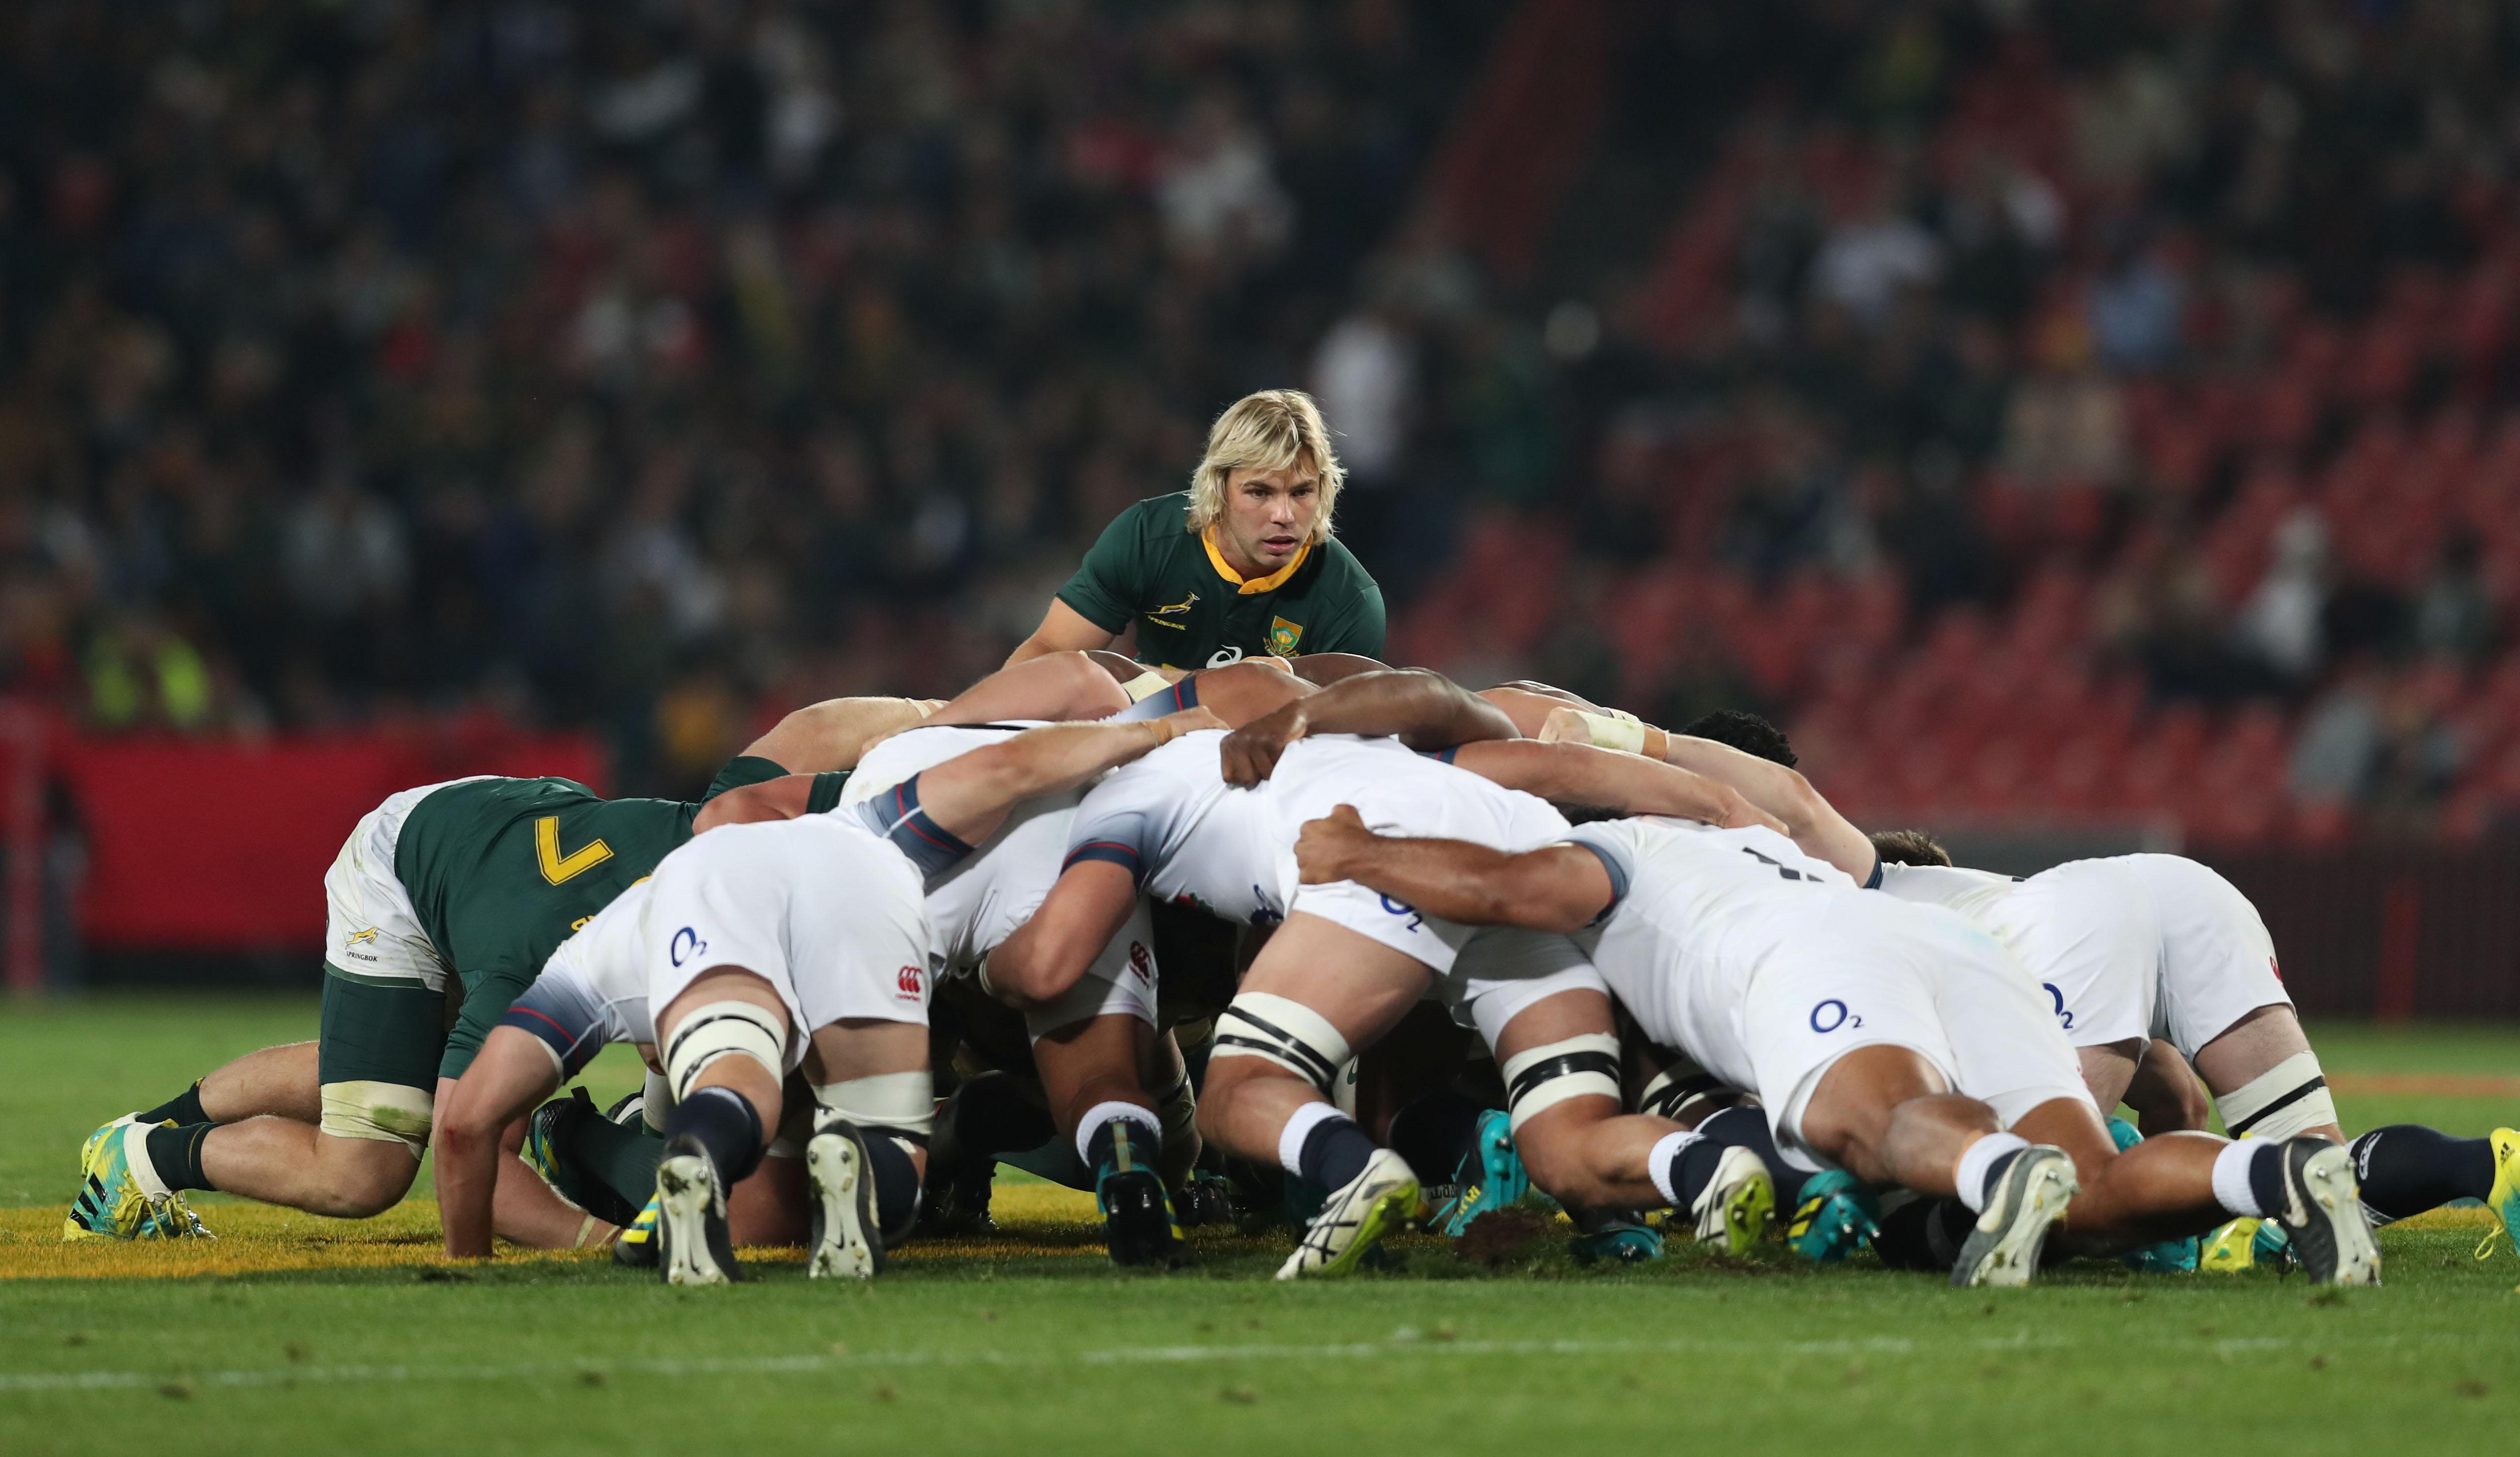 Six Nations needs the Springboks, not Italy, says Eddie - SARugbymag